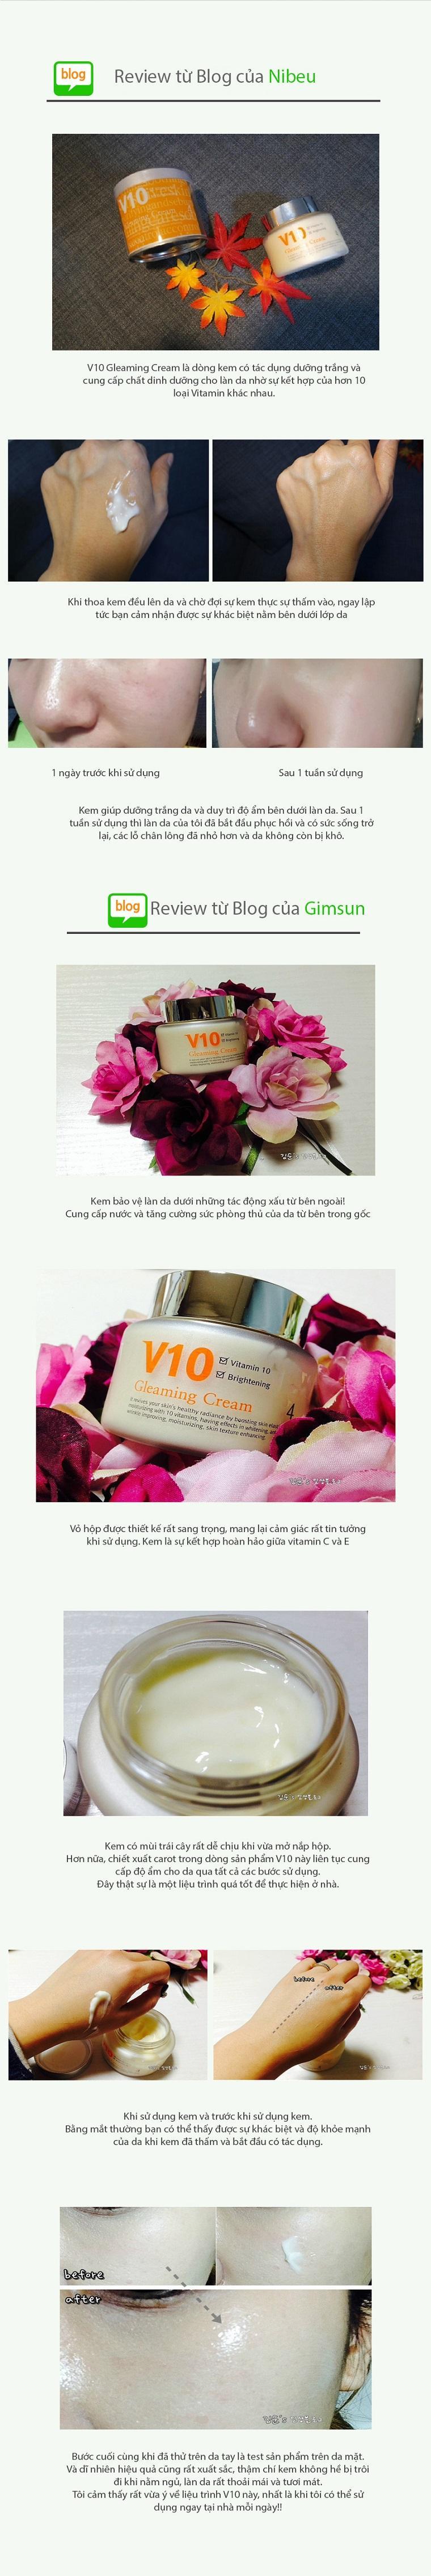 v10-cream-01-copy-2-.jpg